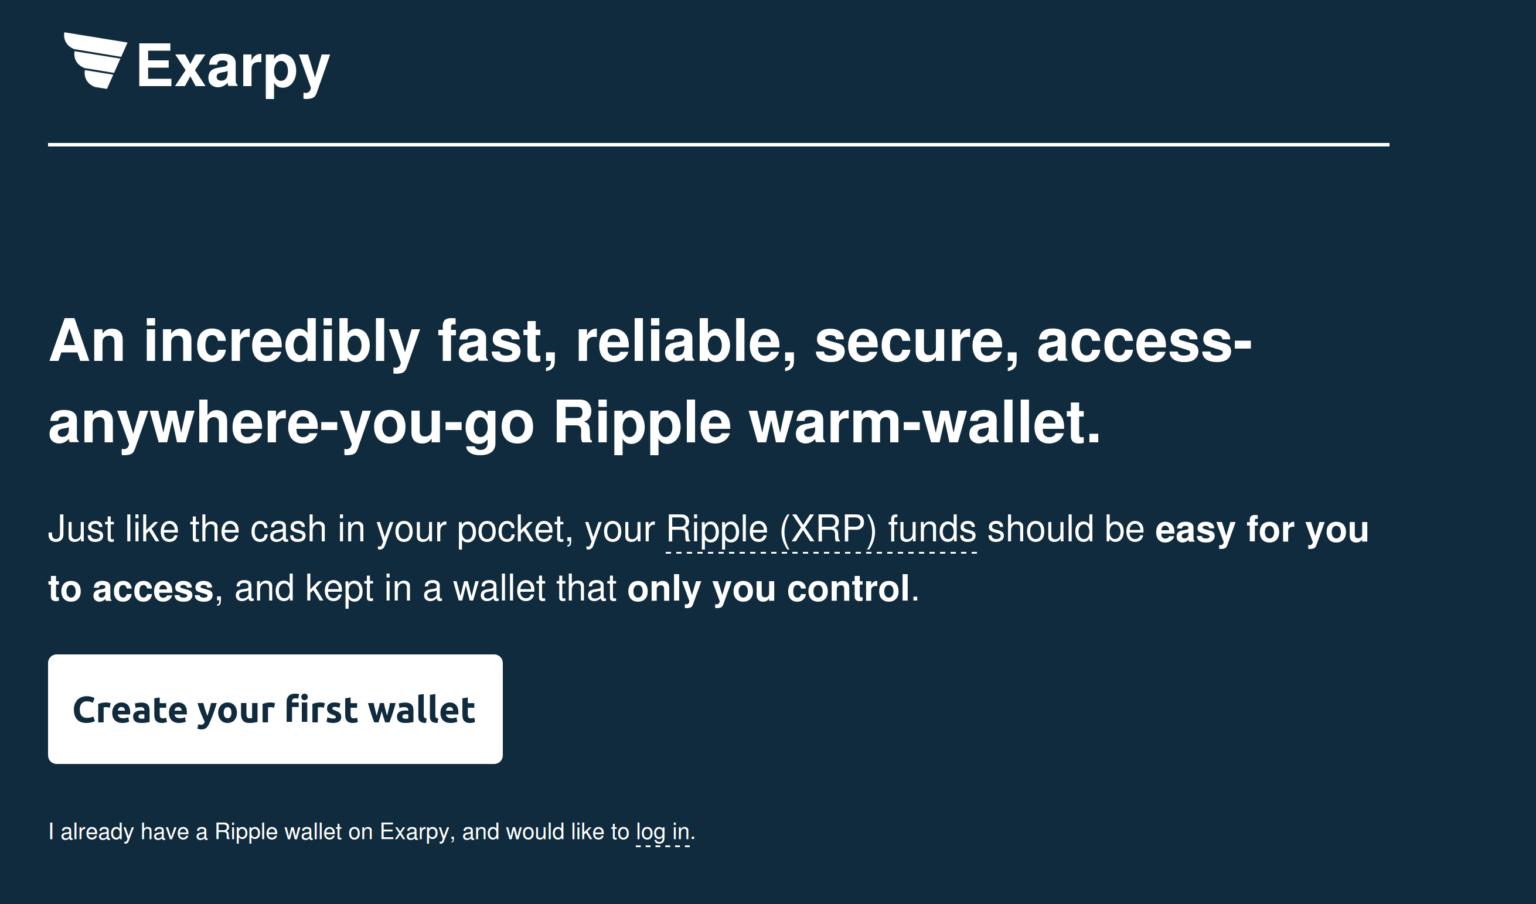 exarpy ripple